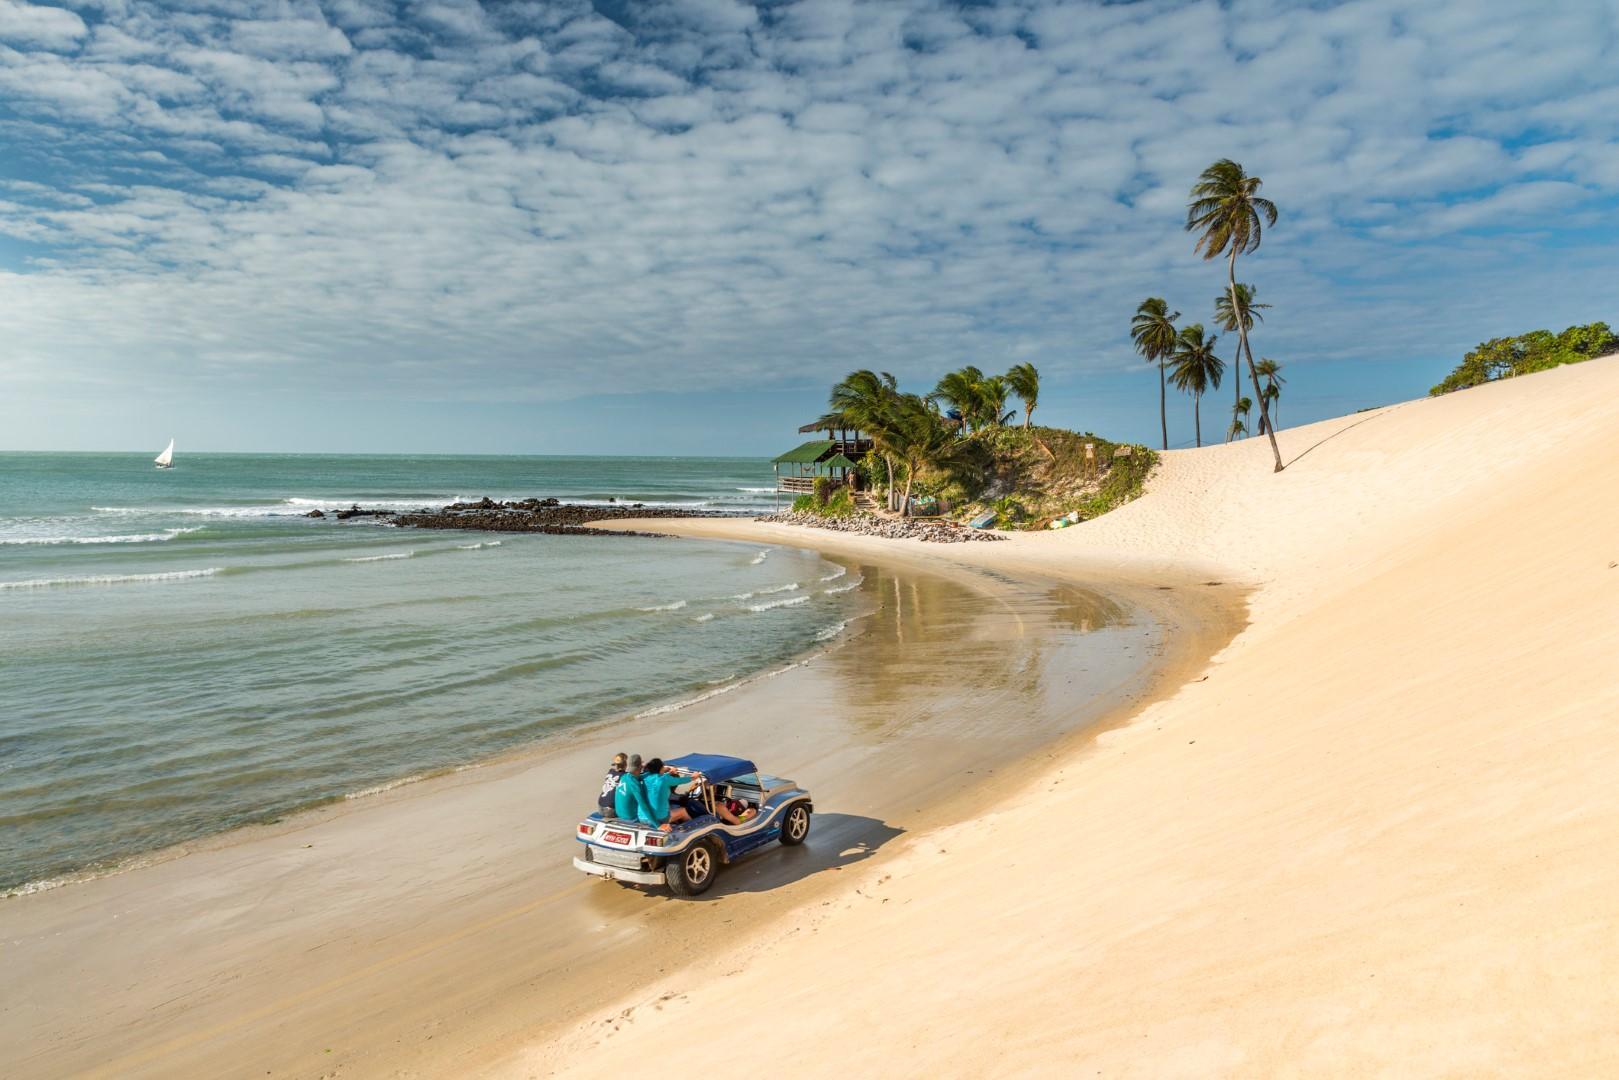 Dieci spiagge decisamente bizzarre